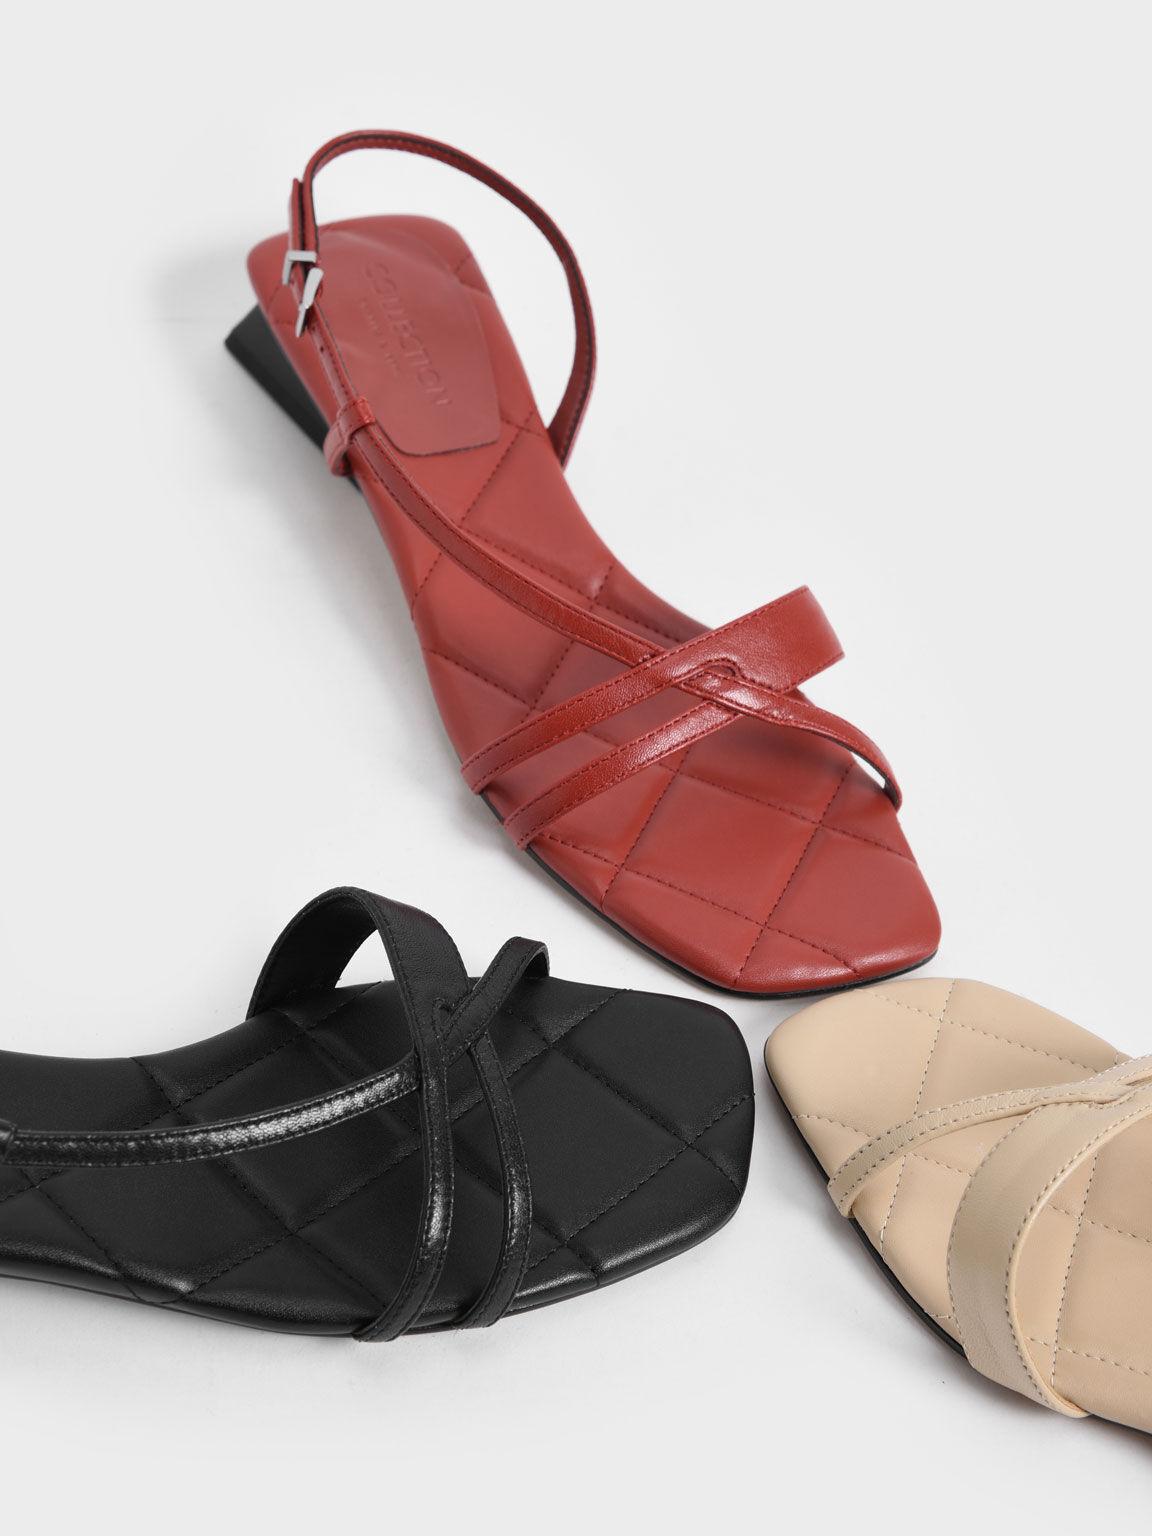 Leather Trapeze Heel Slingback Sandals, Brick, hi-res